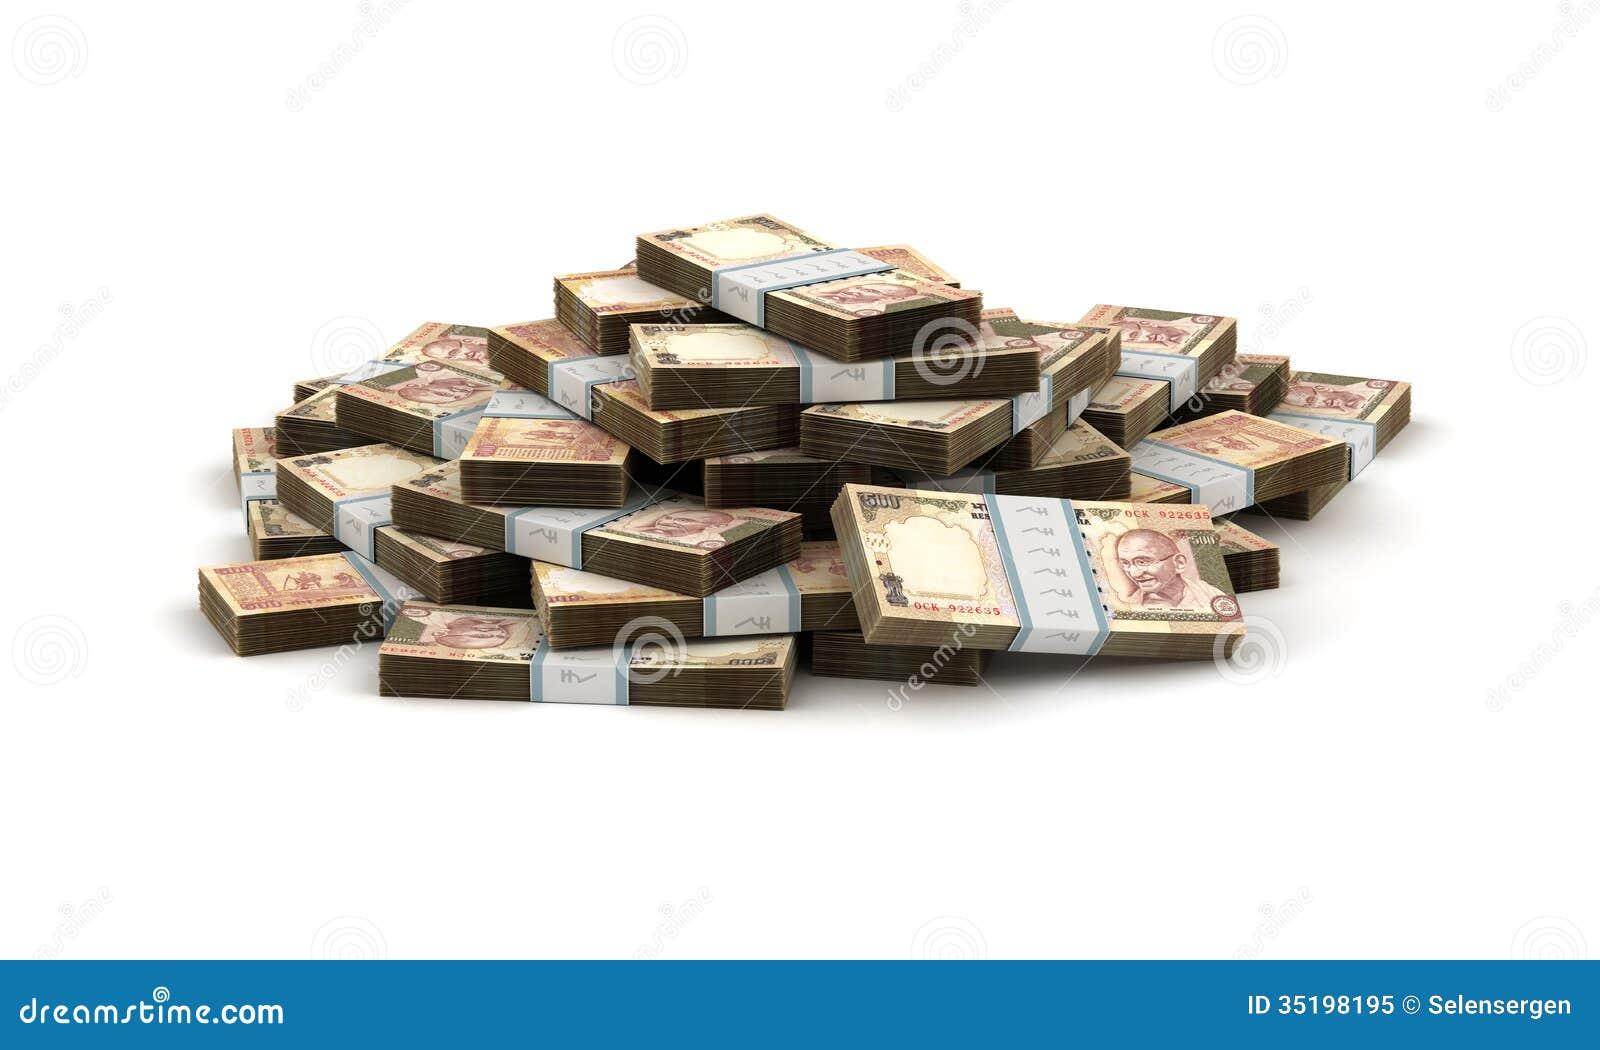 123 million dollars in rupees